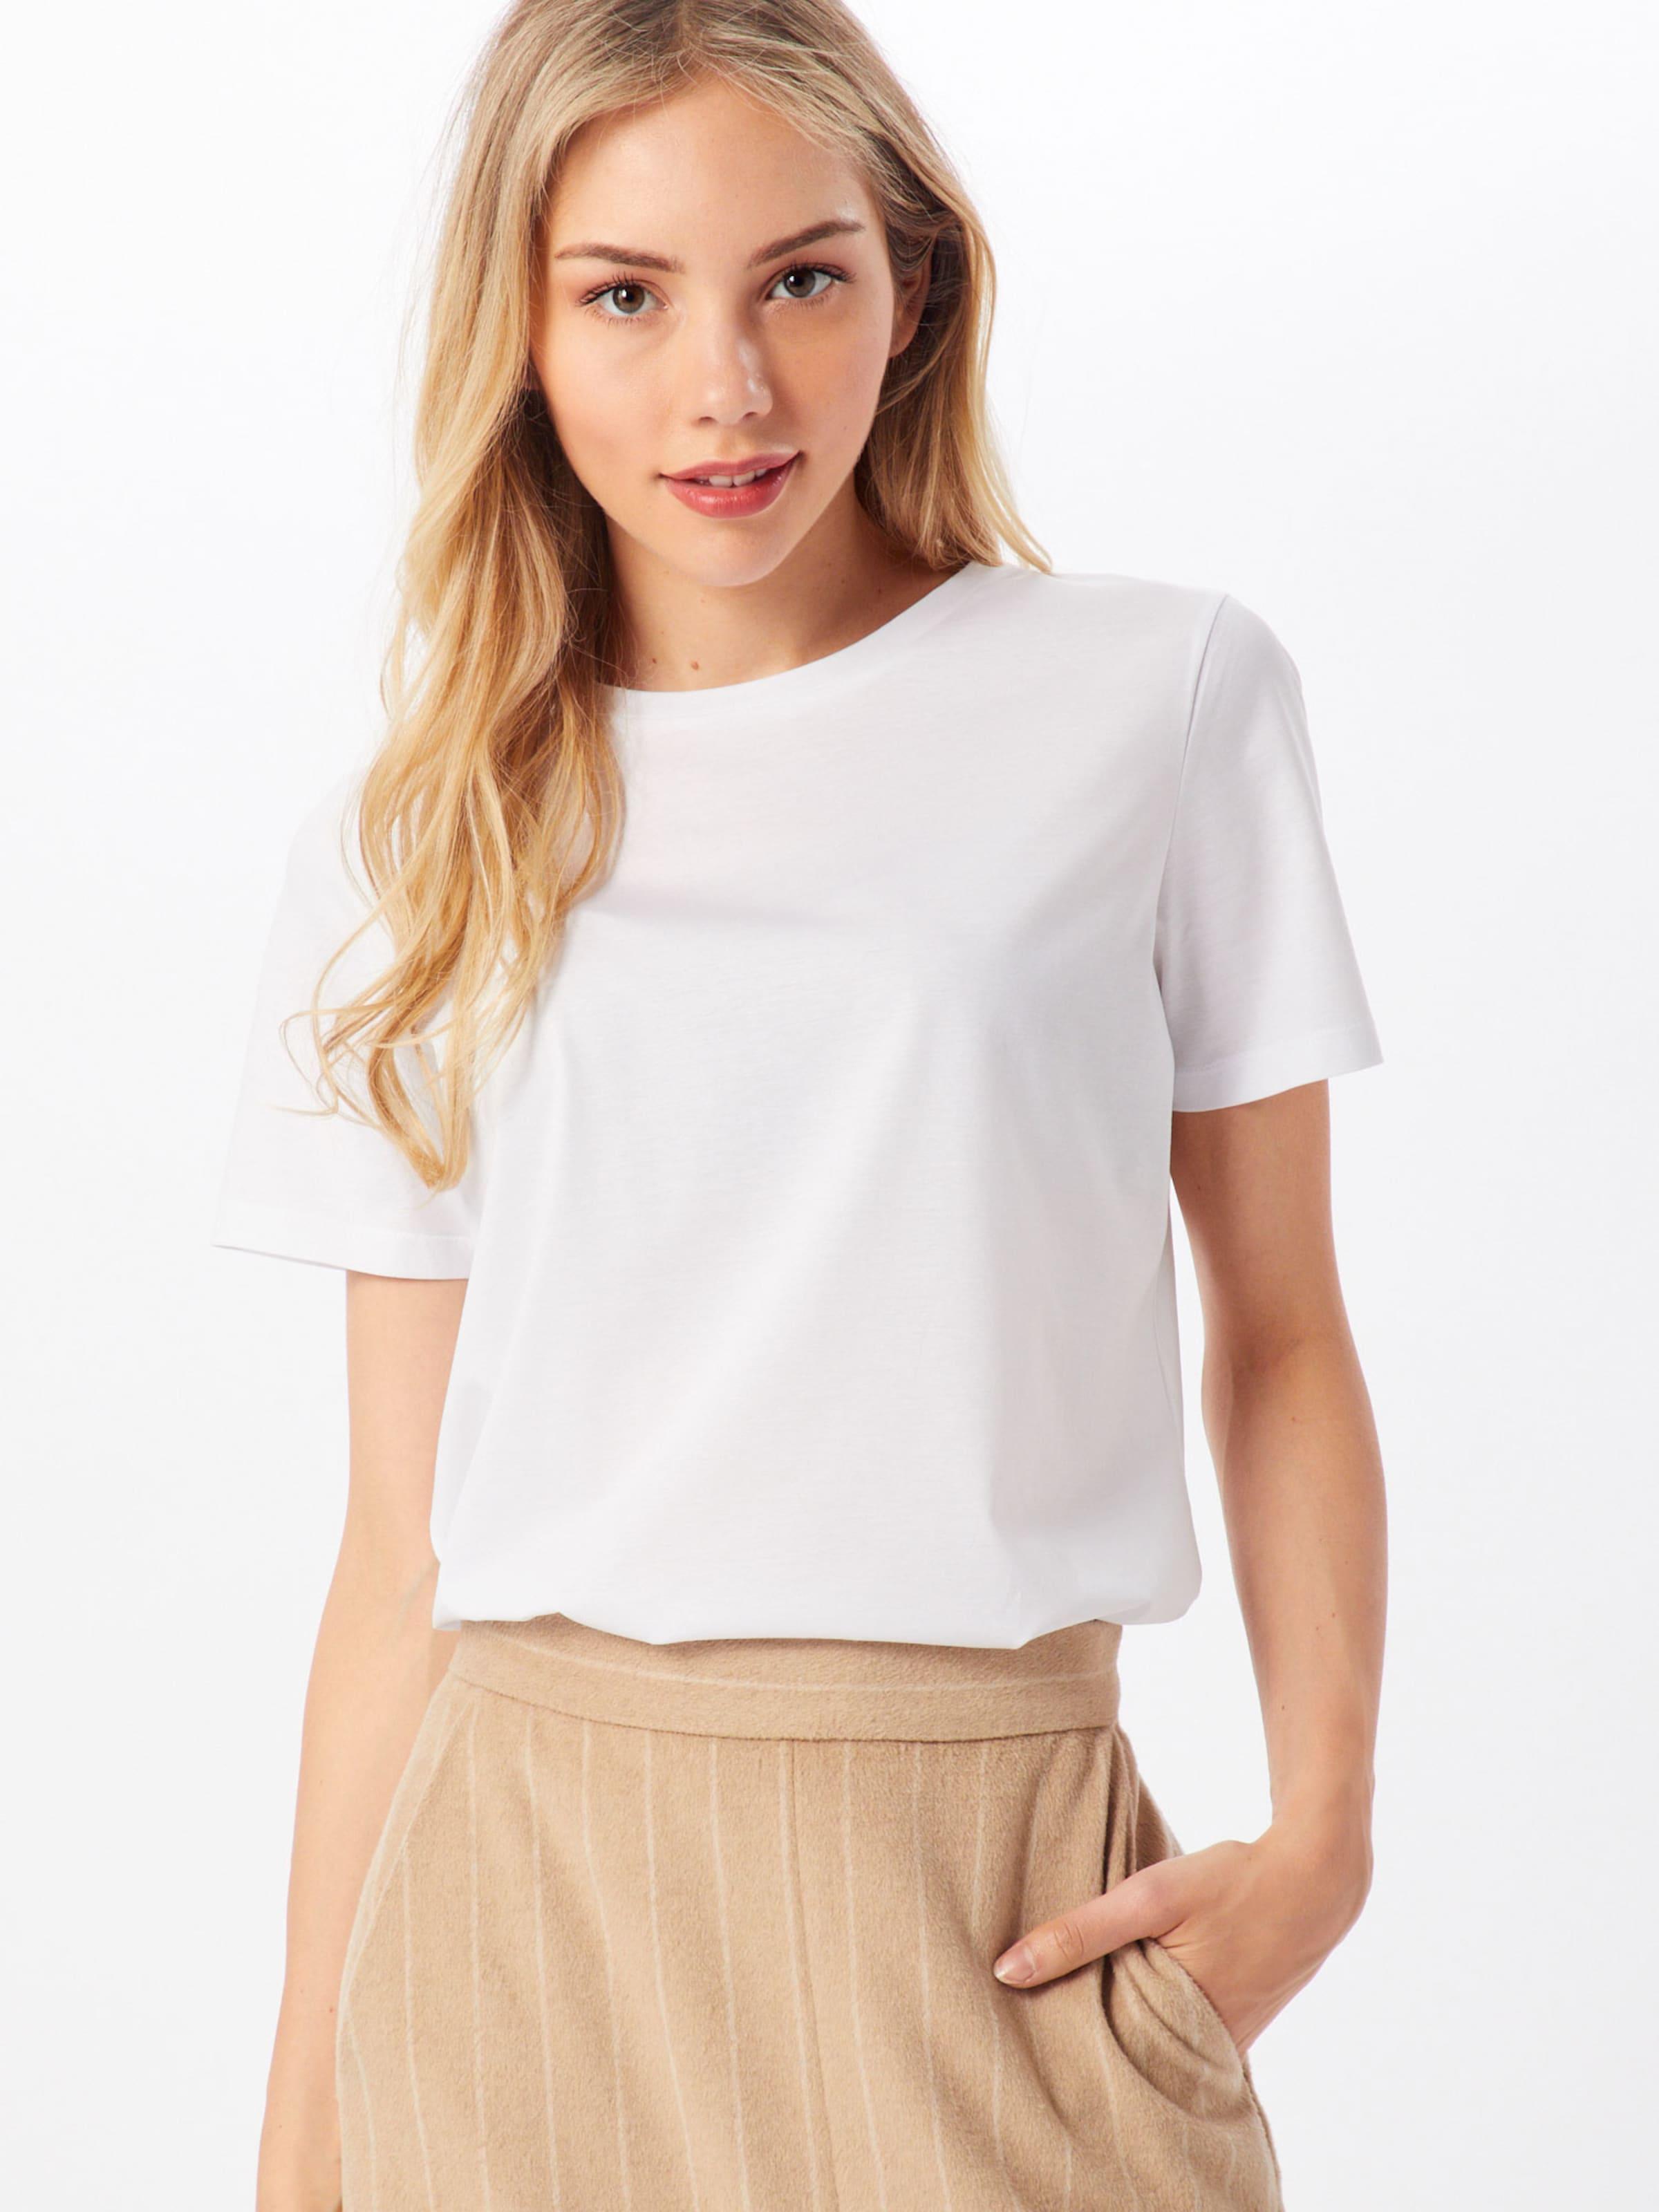 'anisia' Drykorn In Weiß 'anisia' 'anisia' Shirt Weiß Shirt Shirt In Drykorn Drykorn mwvN8n0O